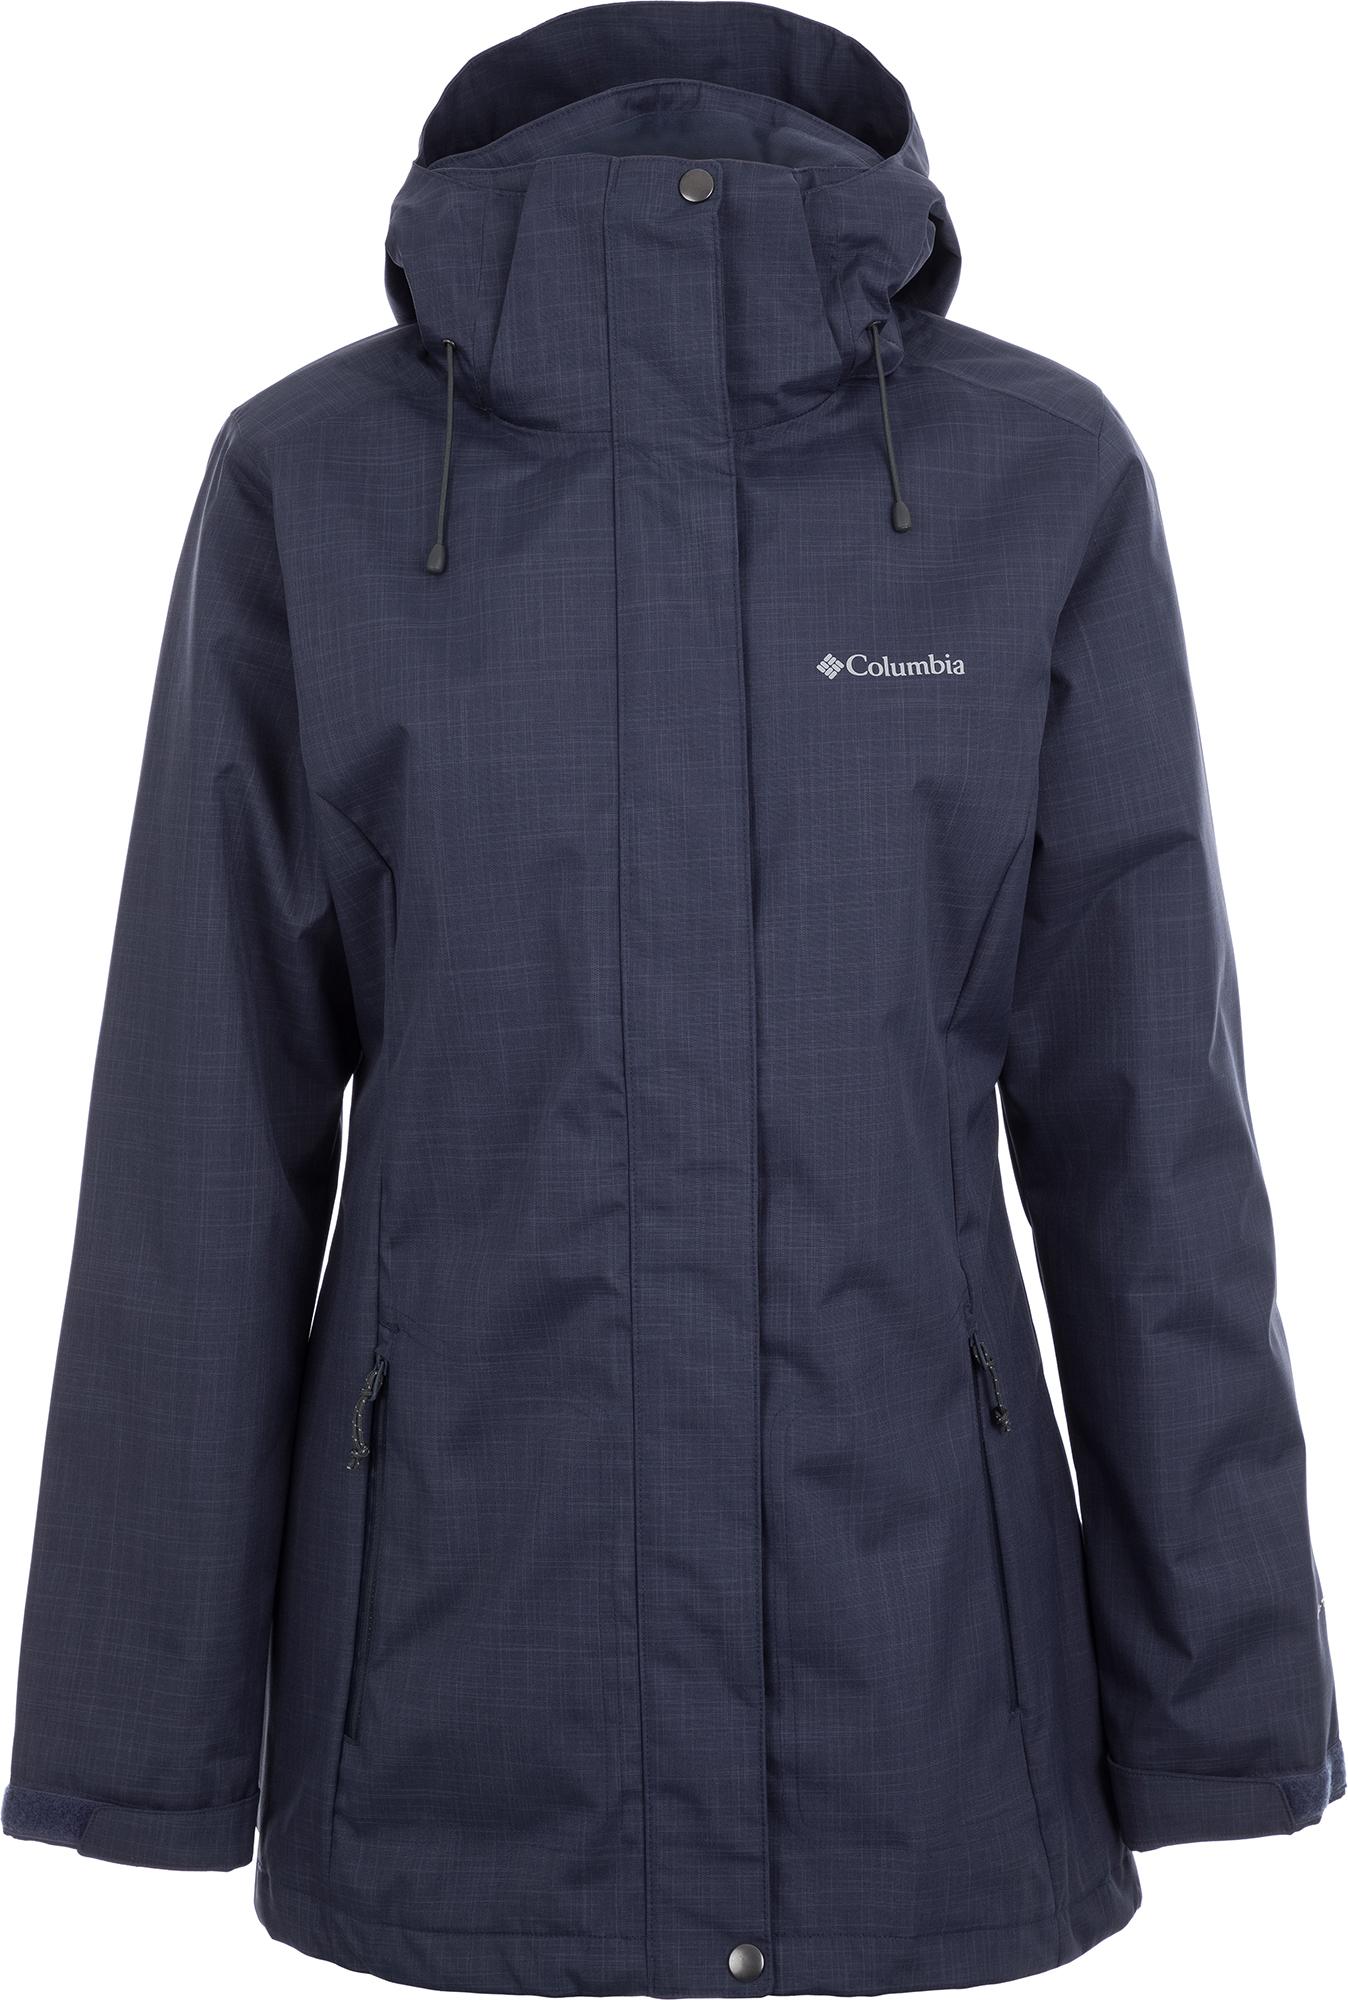 Columbia Куртка утепленная женская  Icy Cape Insulated, размер 50